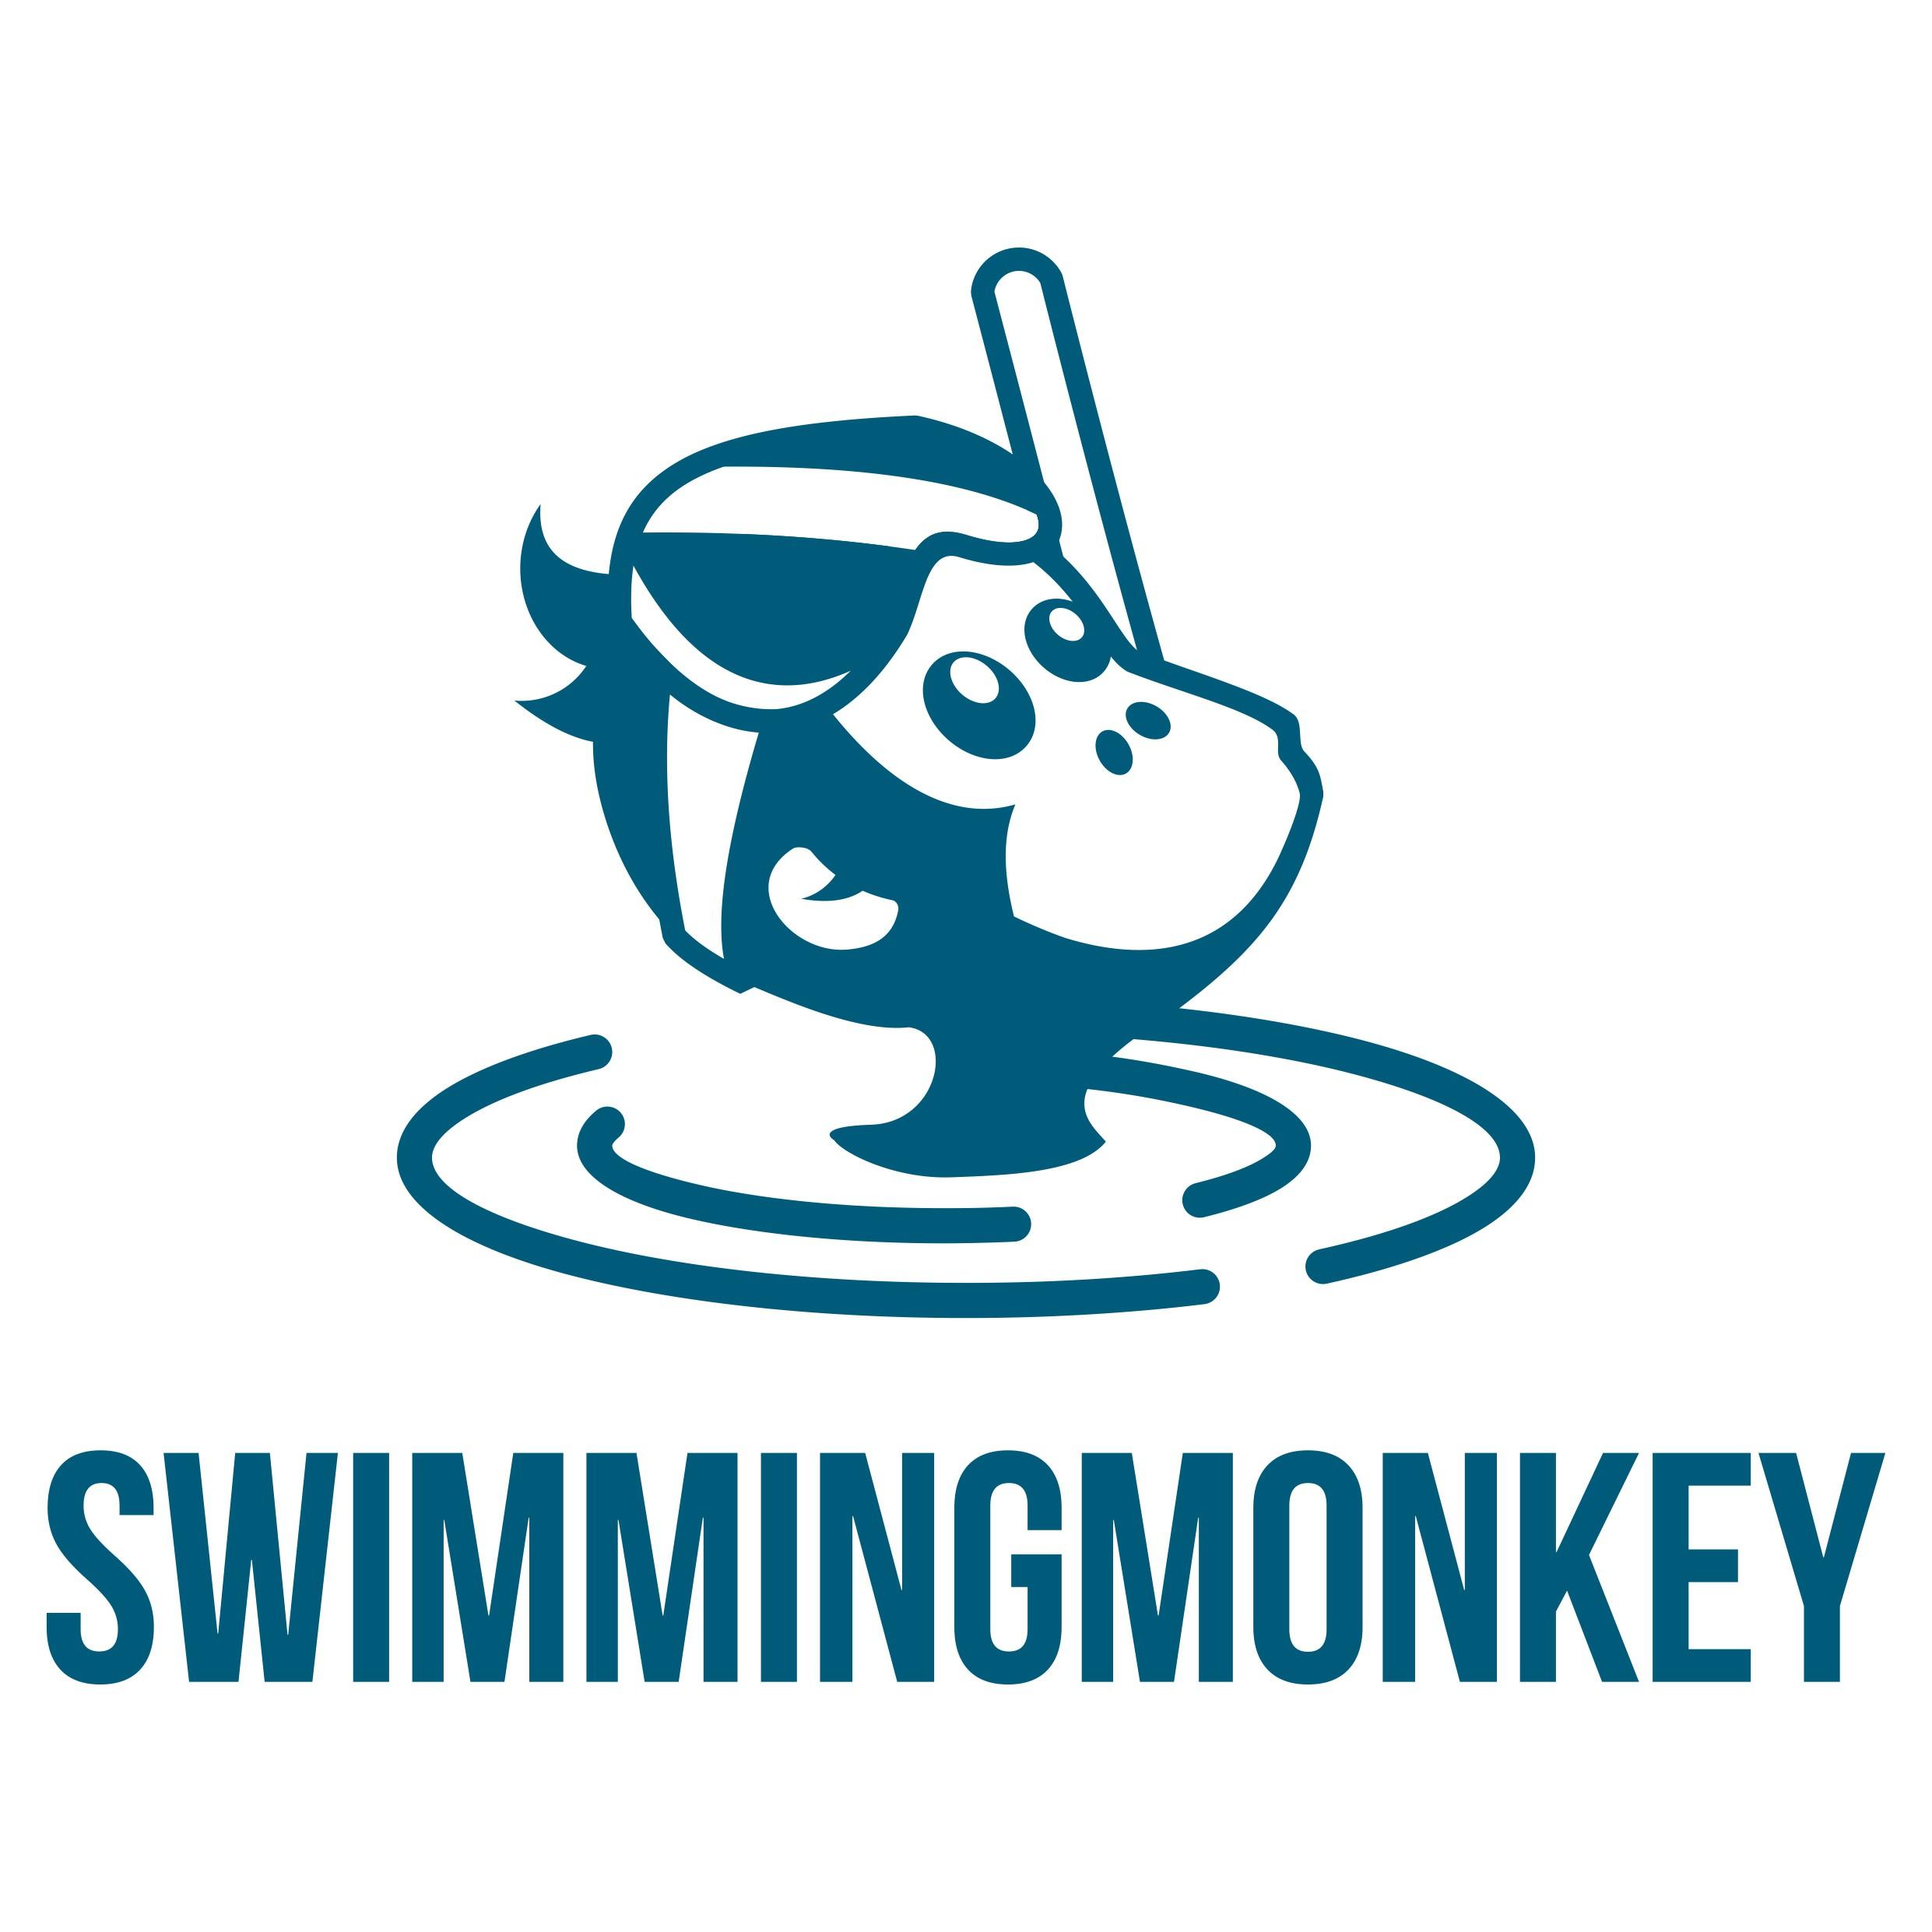 New logo wanted for SwimmingMonkey !